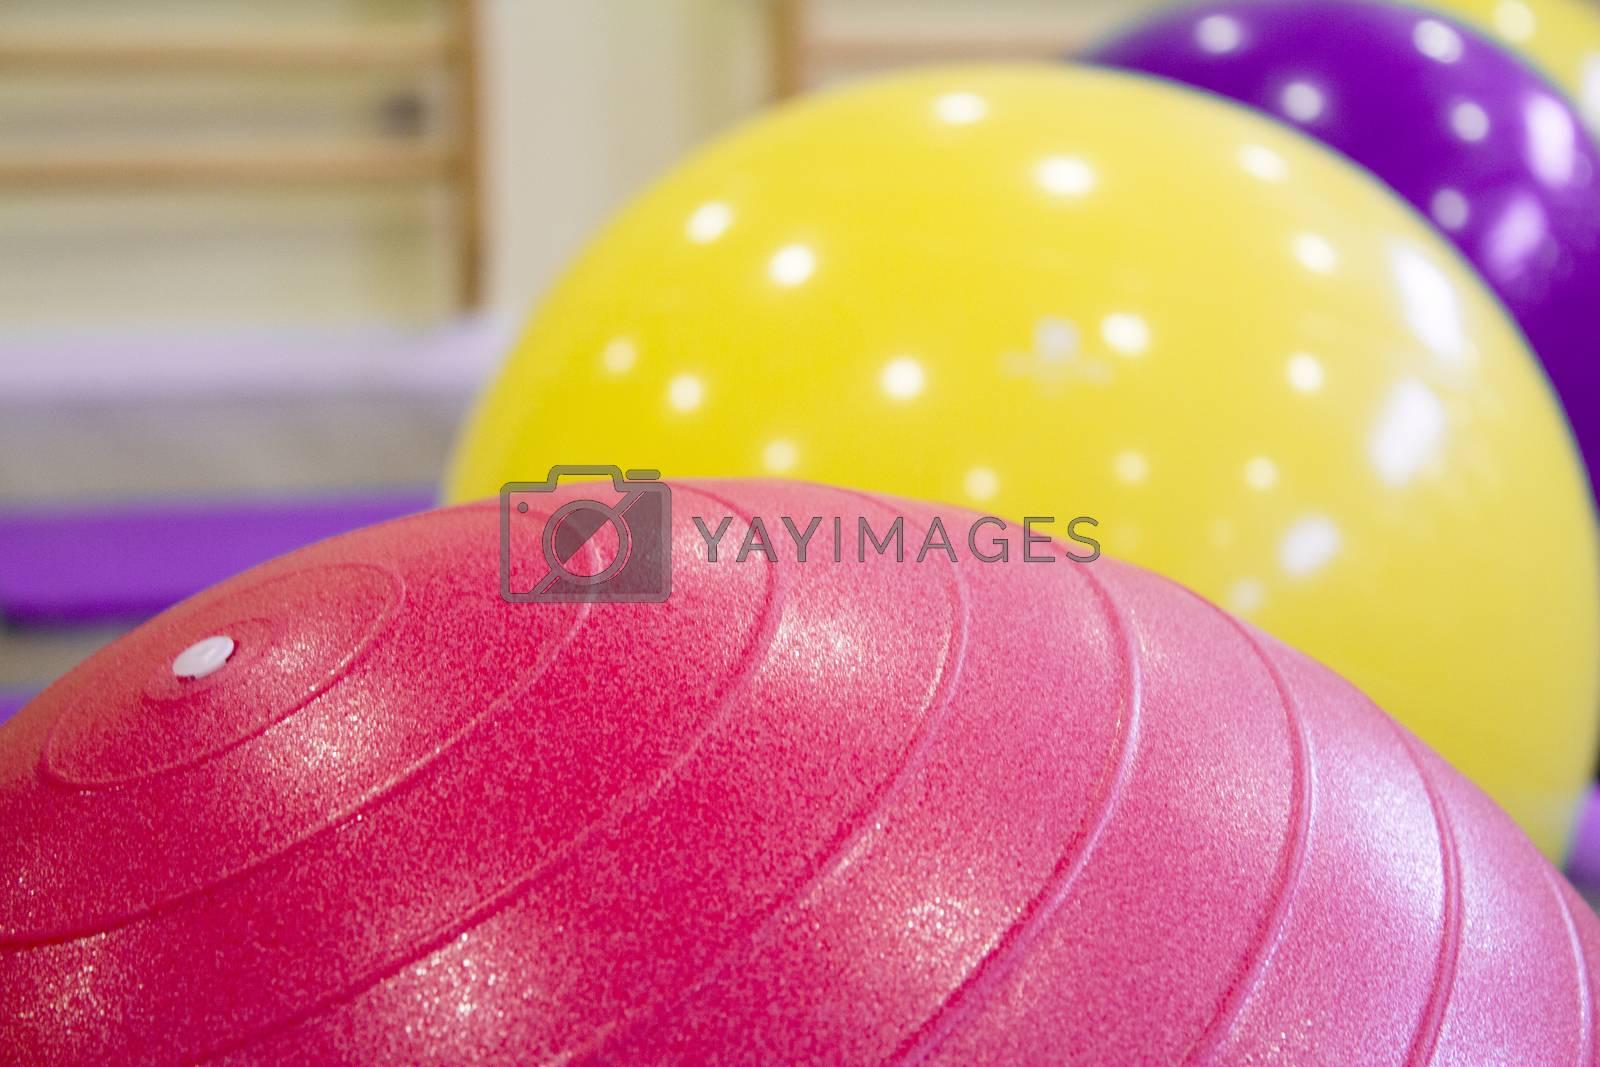 Colored balls for gymnastics and pilates classes